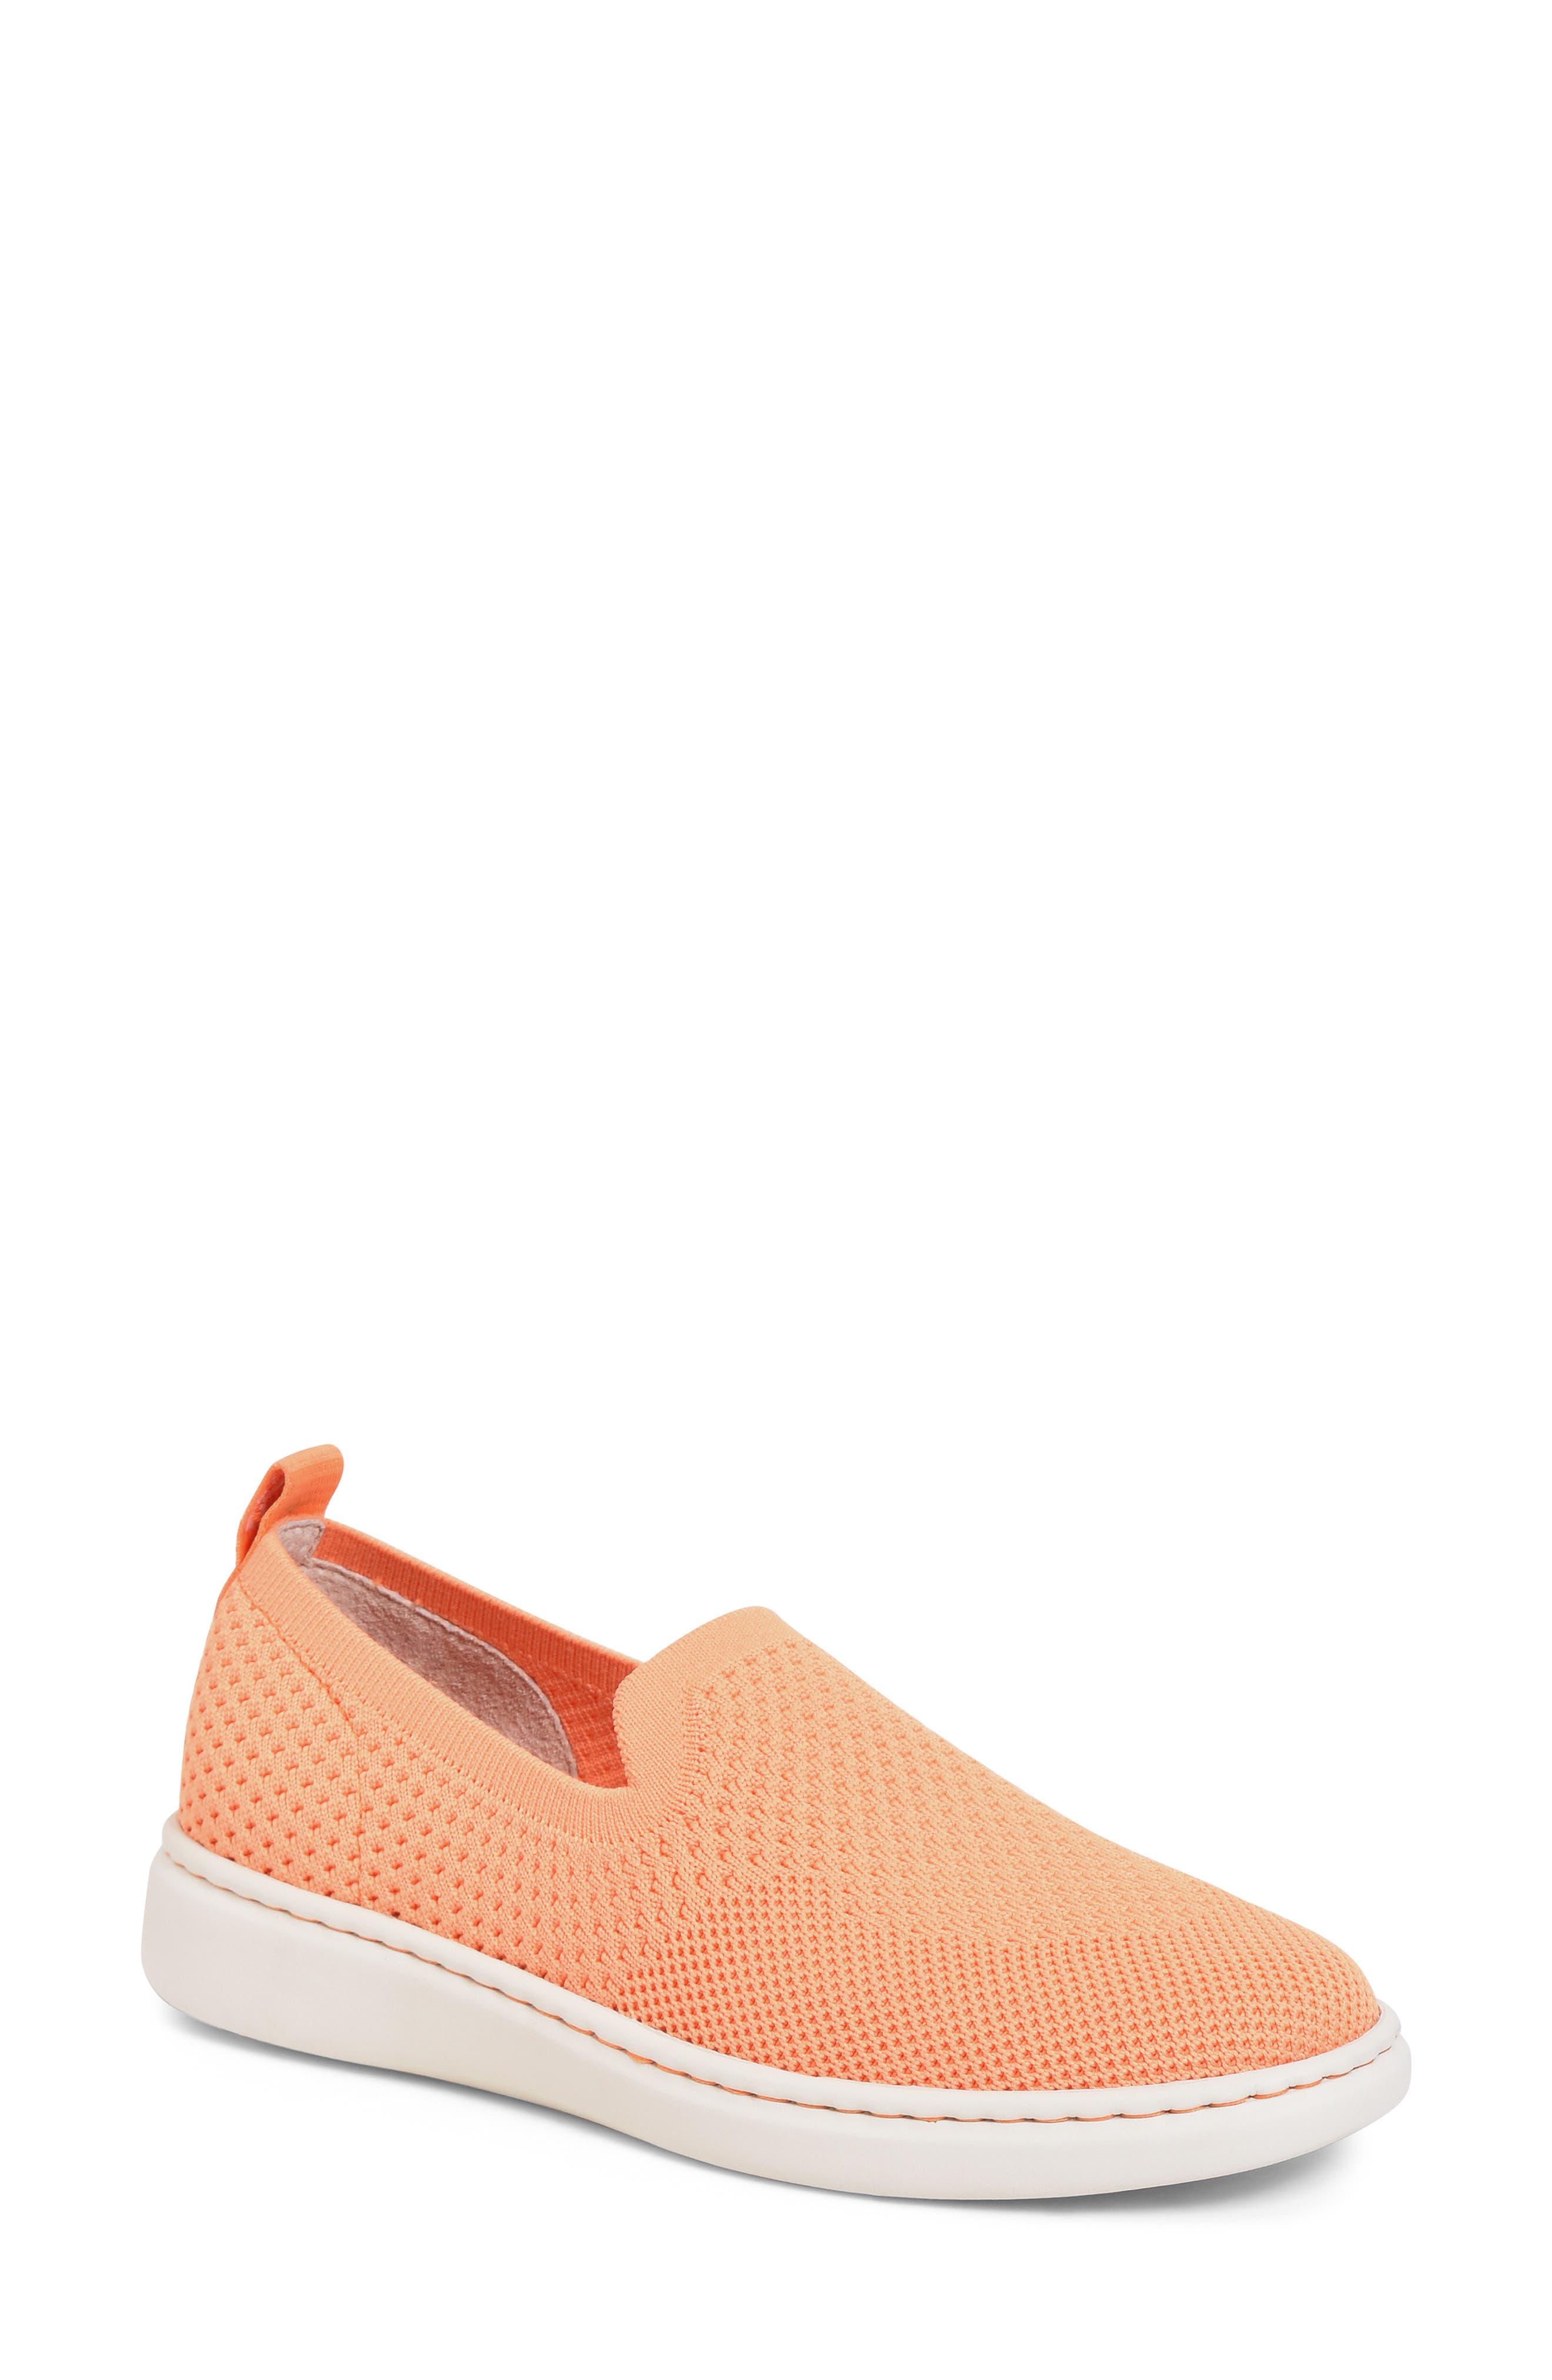 Image of Born Patton Slip-On Sneaker